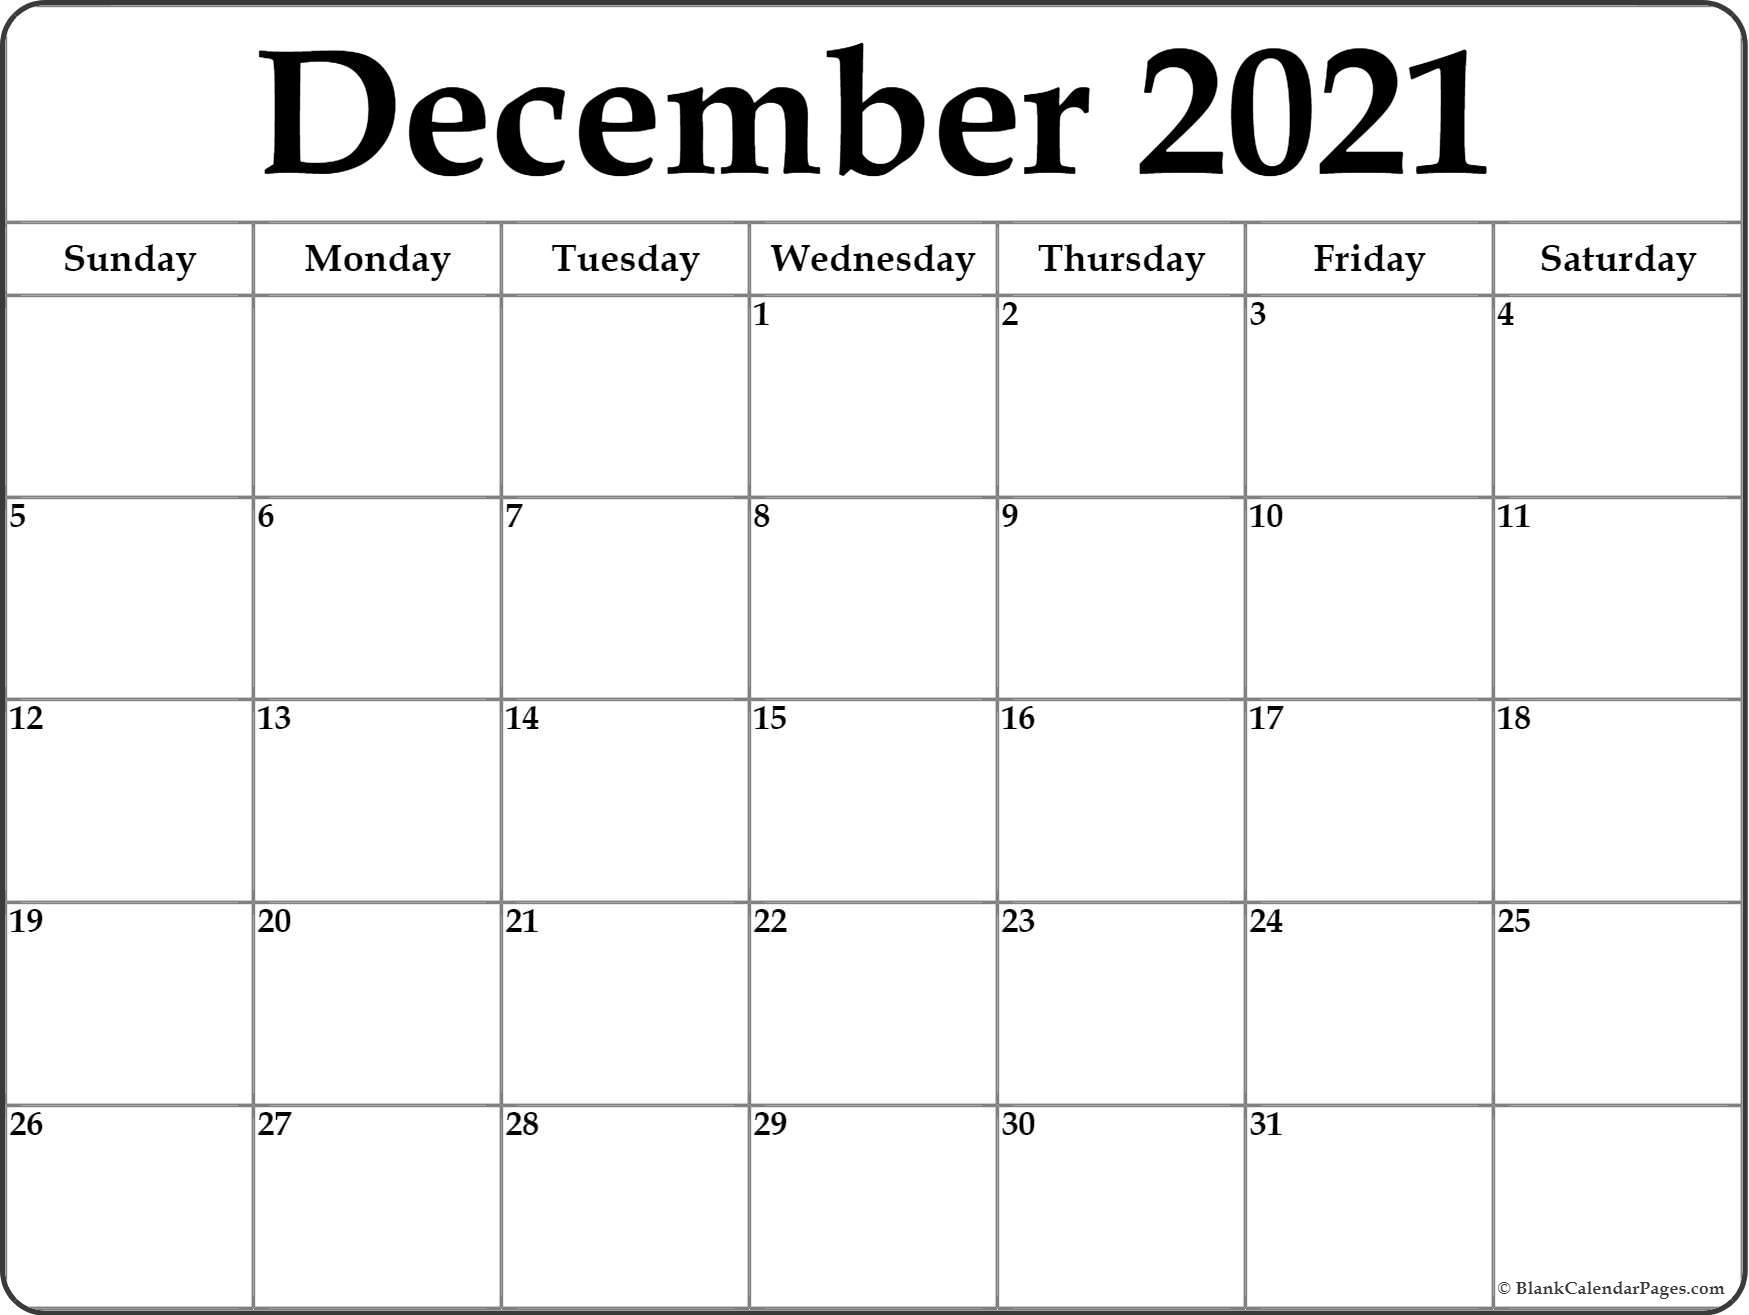 December 2021 Calendar | Free Printable Monthly Calendars